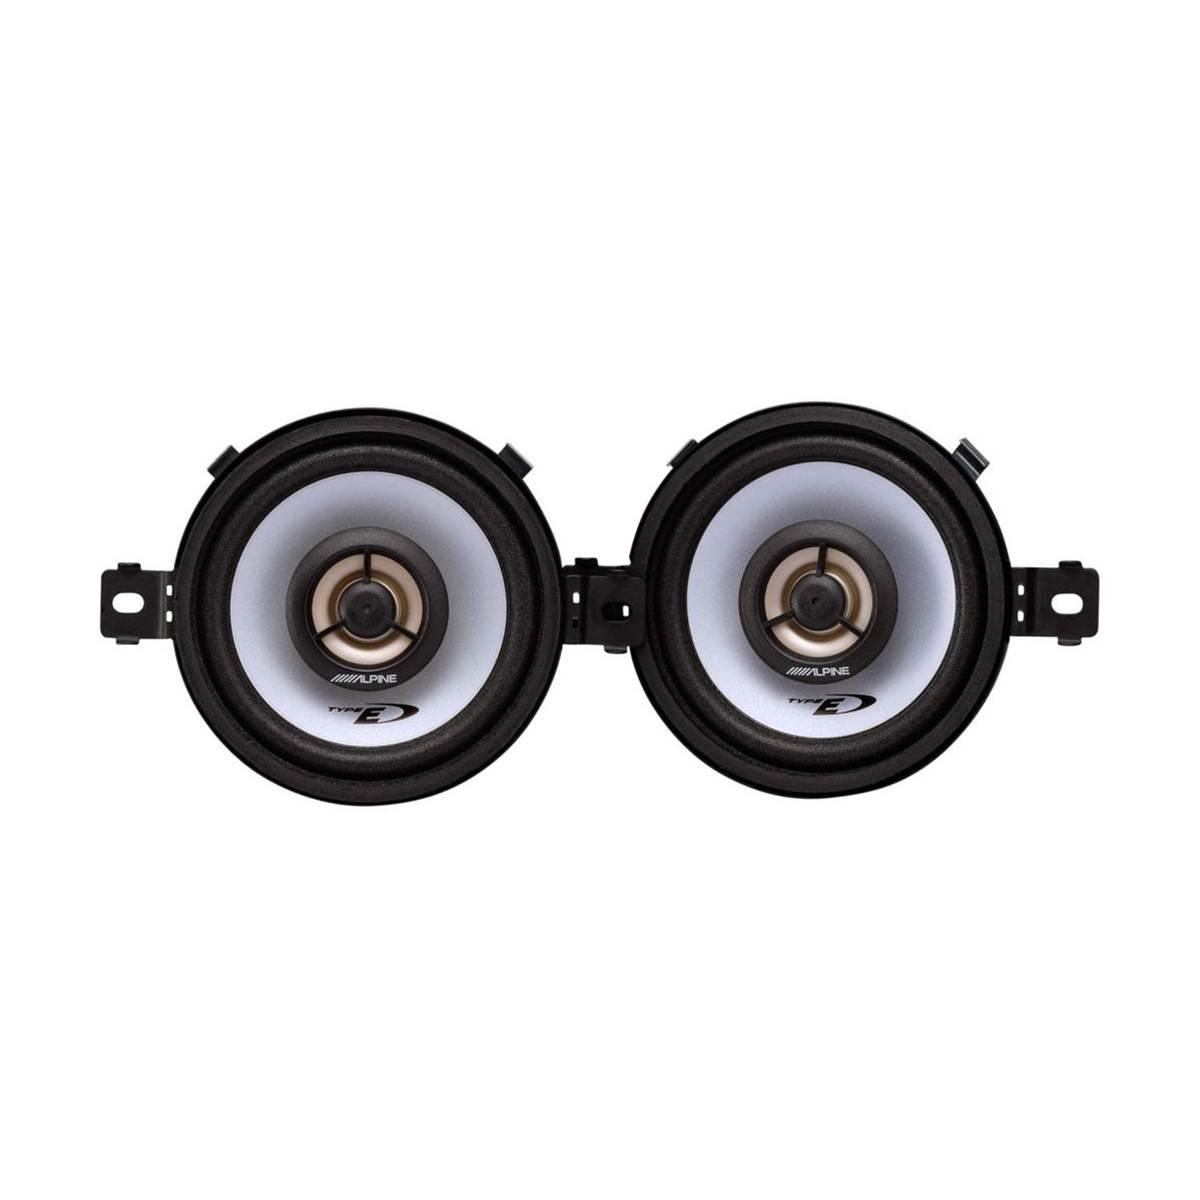 Haut-parleurs Alpine SXE-0825S